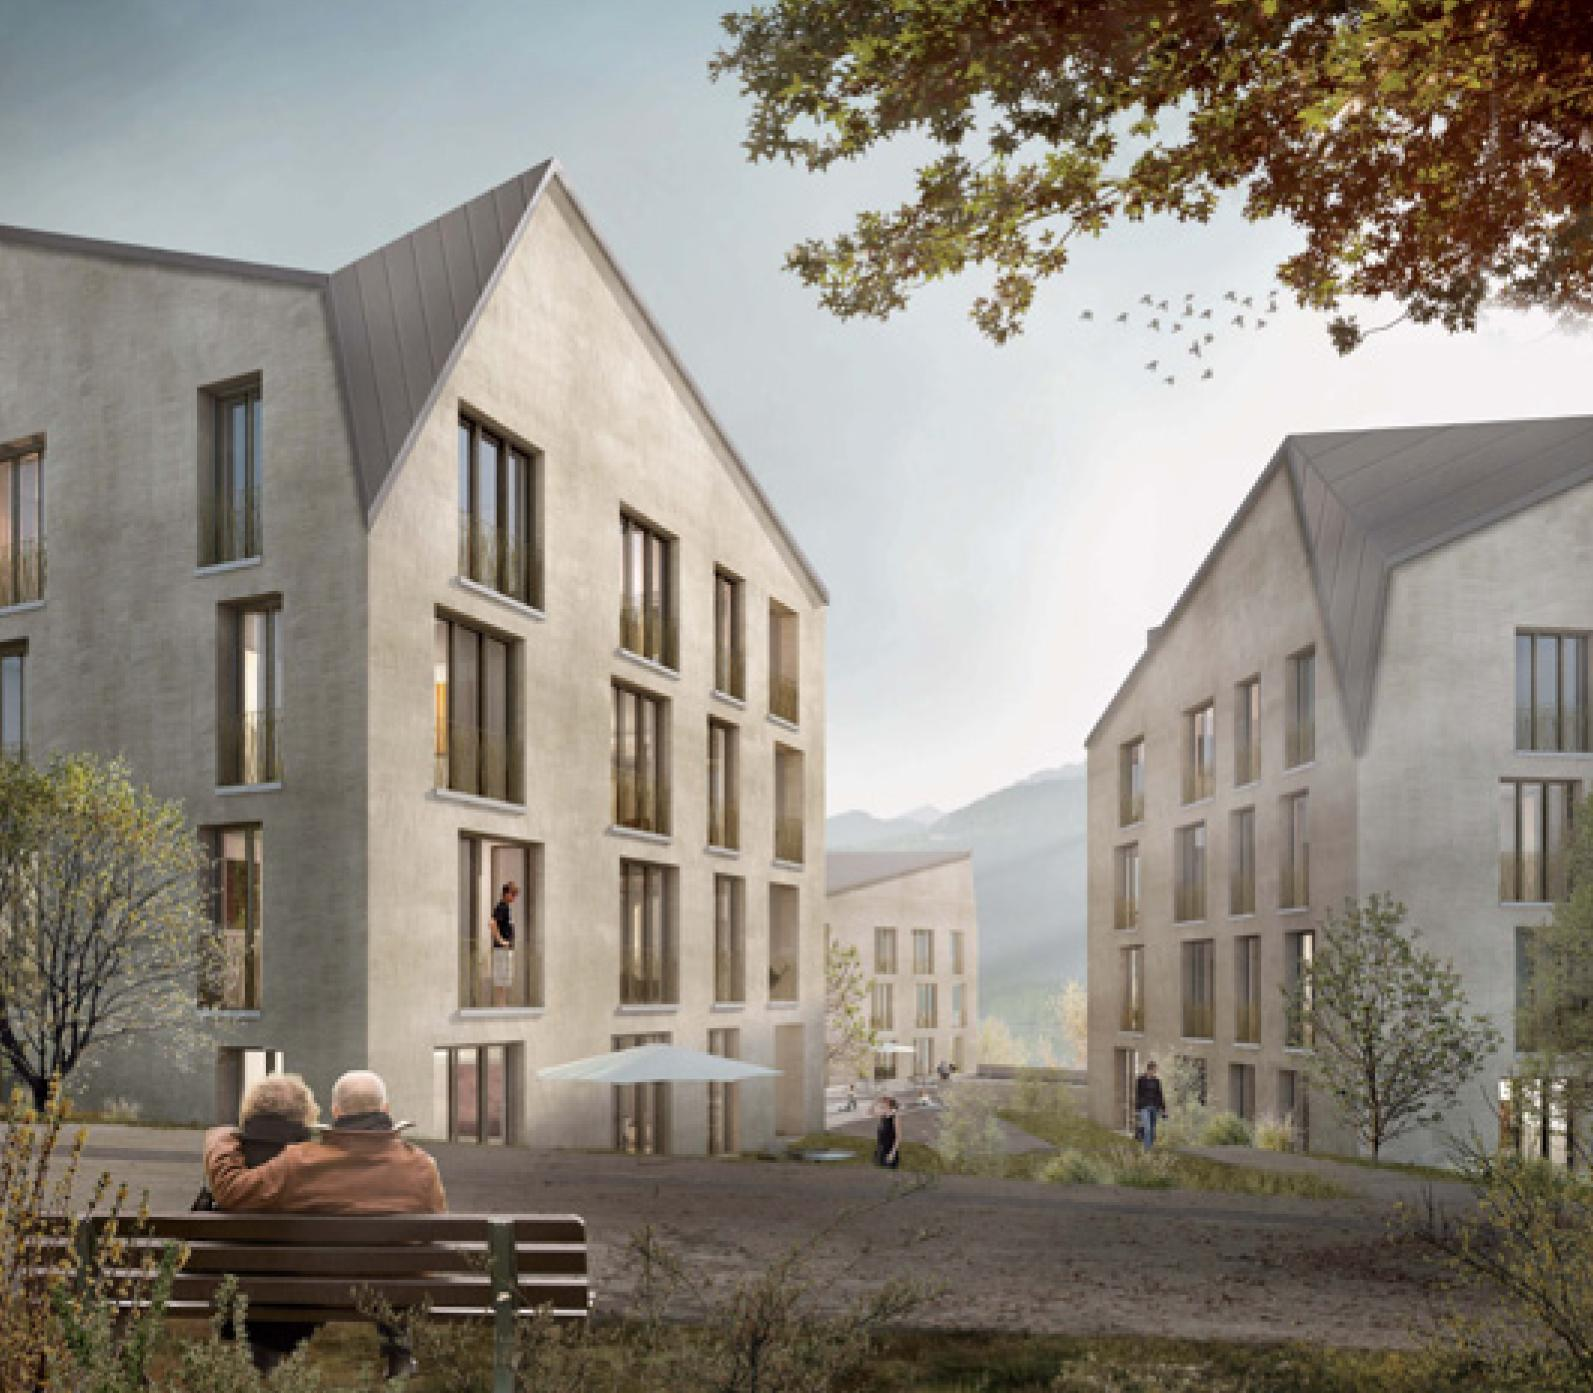 Areal Pelikan in Weesen, Team Wild Bär Heule Architekten, Lyonel